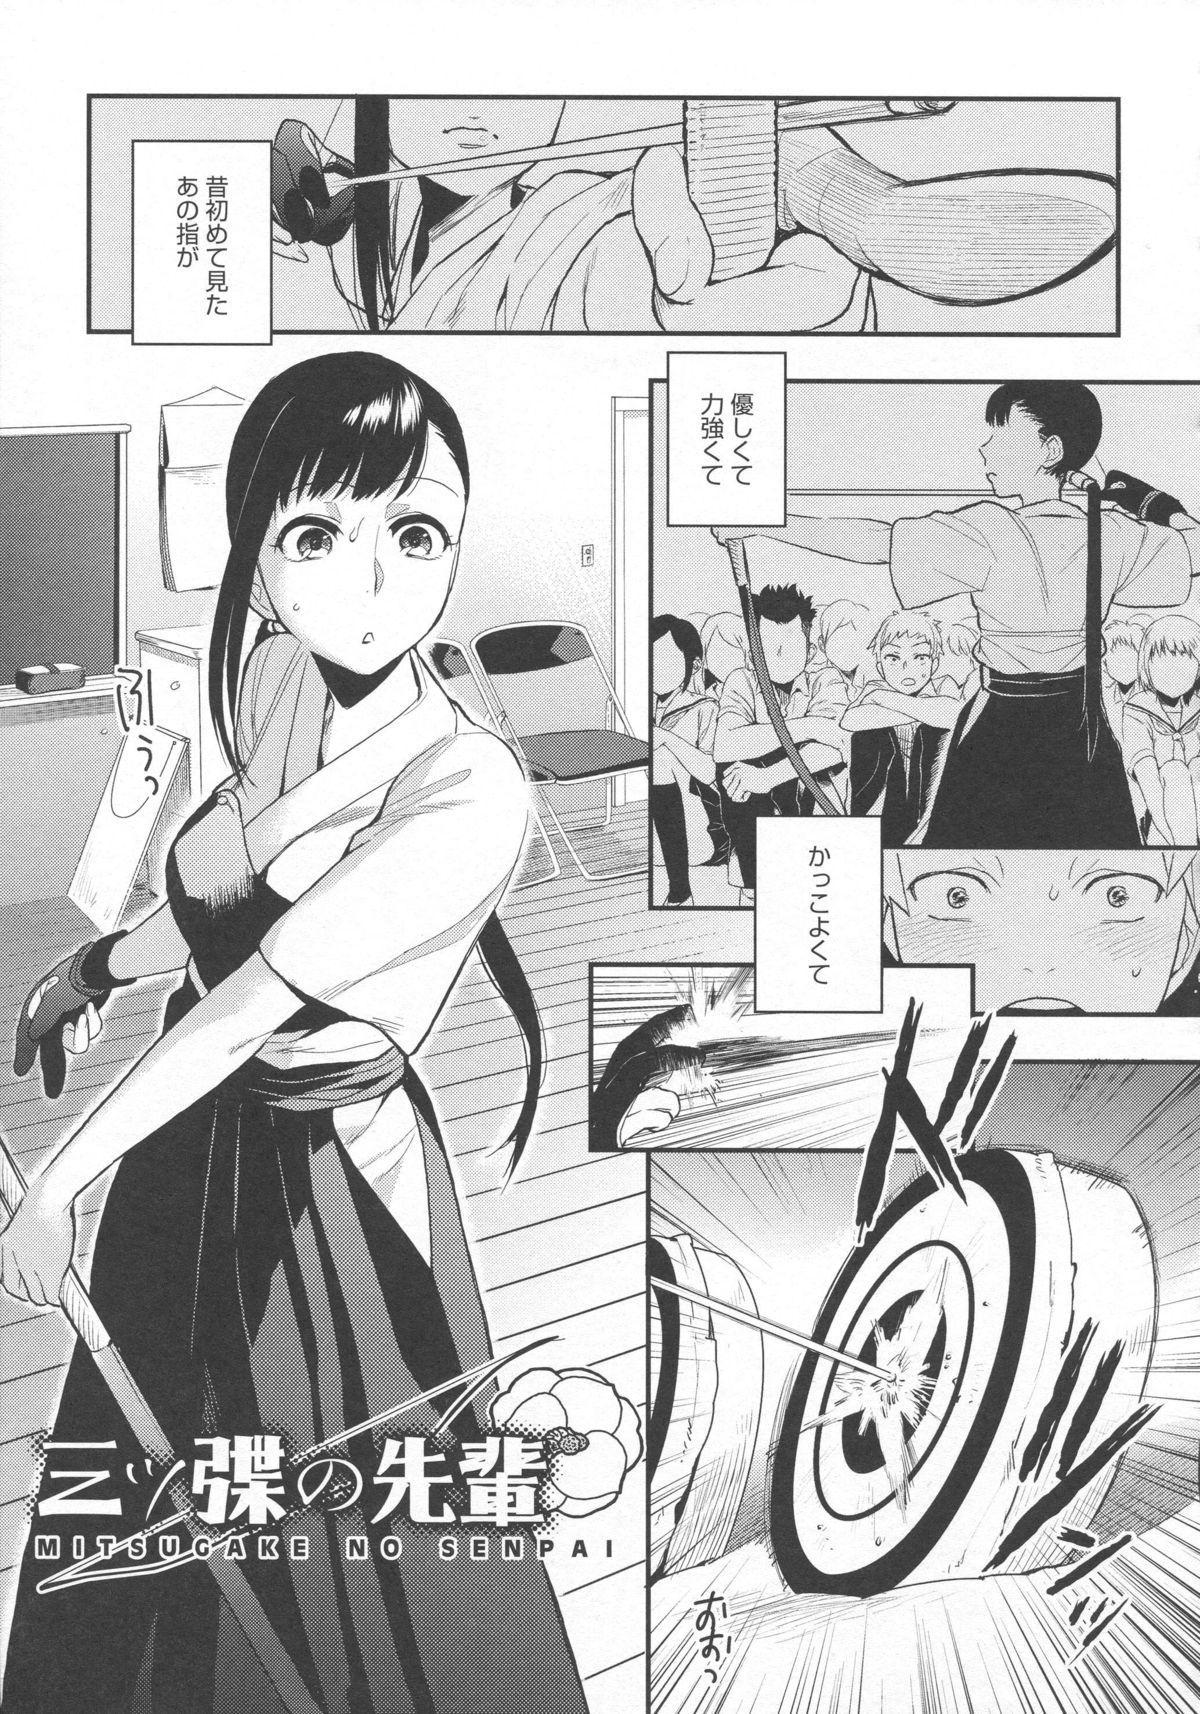 Boku Dake no Yuuyami - Only My Twilight 157